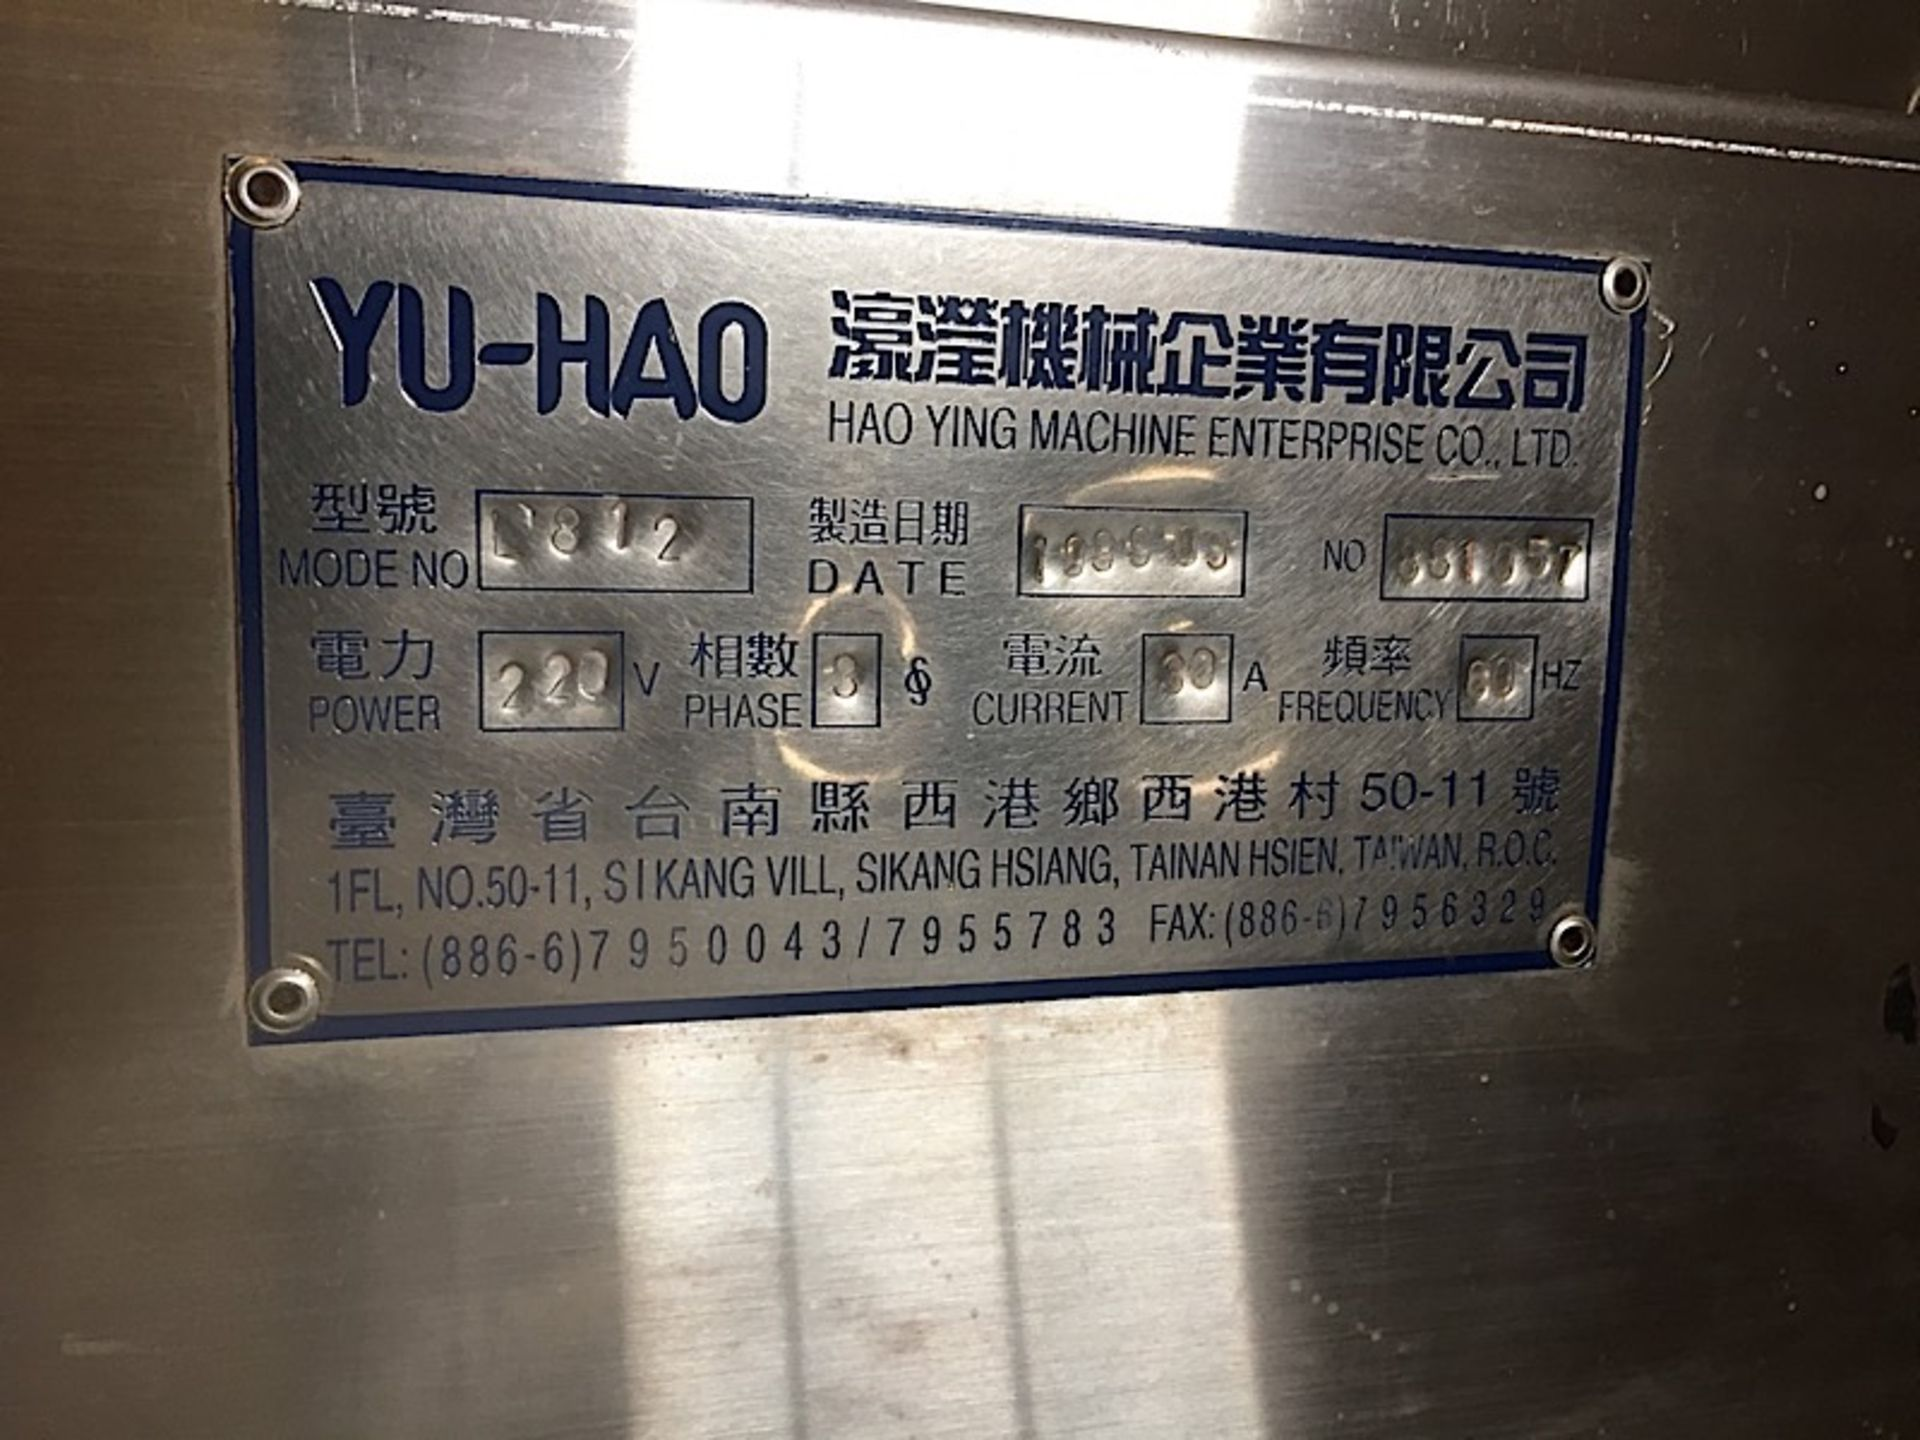 Lot 25 - 1999 YUHAO FILLING MACHINE (L812)